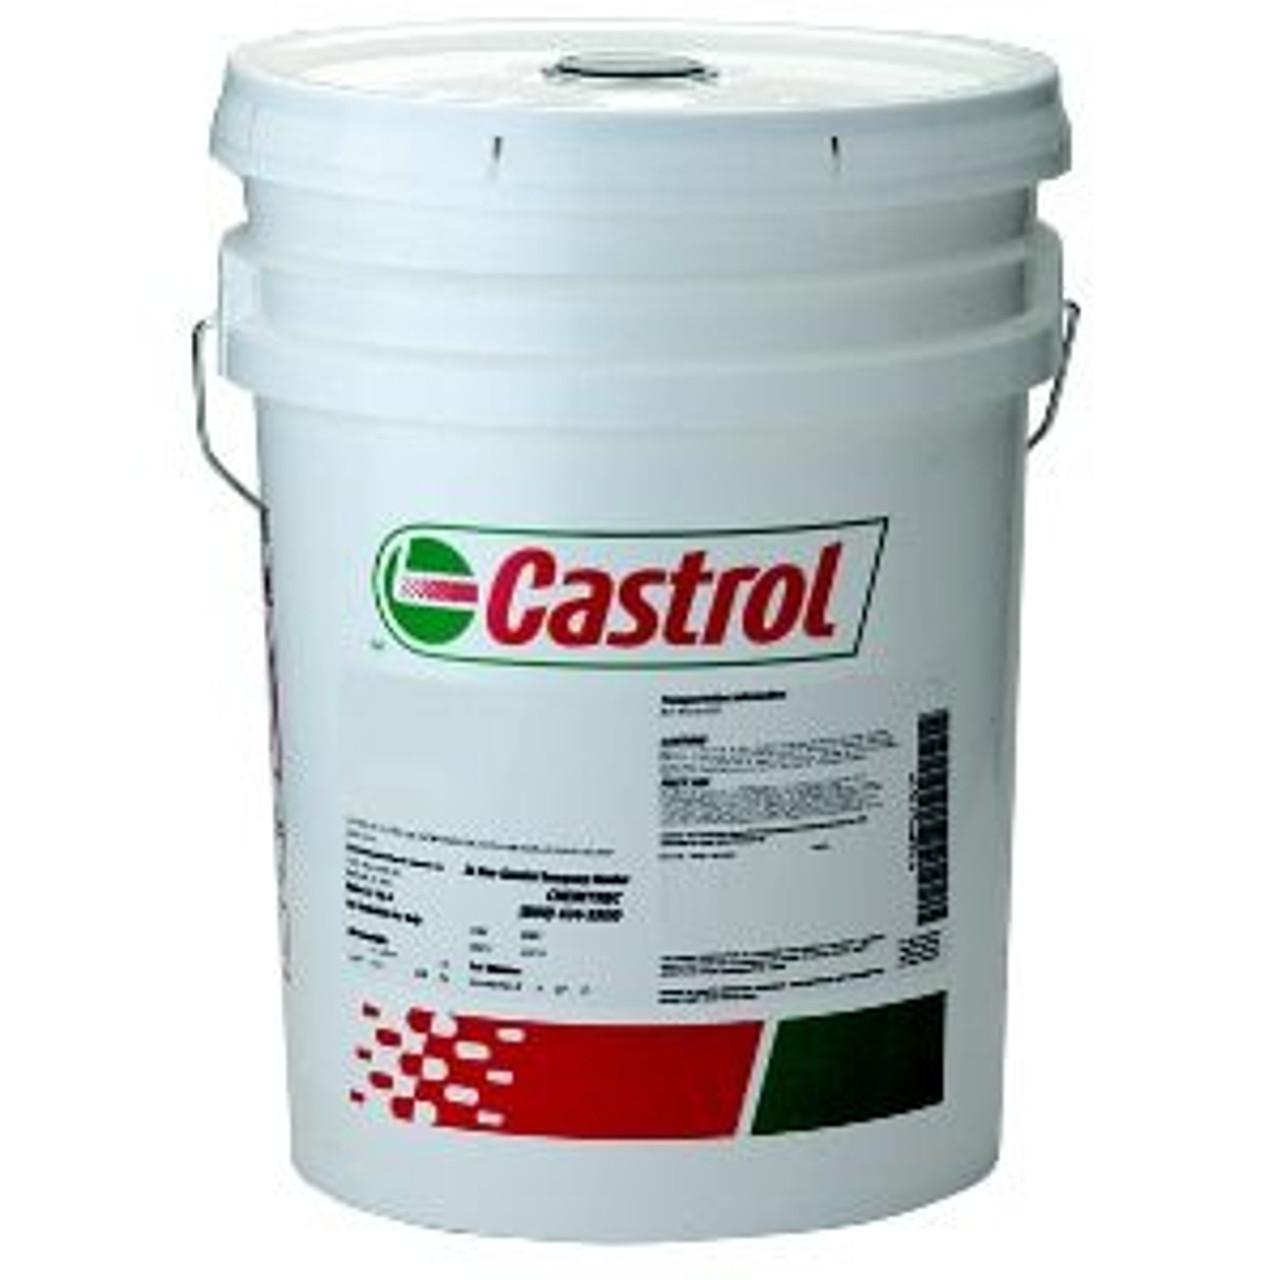 Castrol Optigear  1100/150 Gear Oil 37LB Pail (f/k/a Tribol 1100/150) 71191-DE40